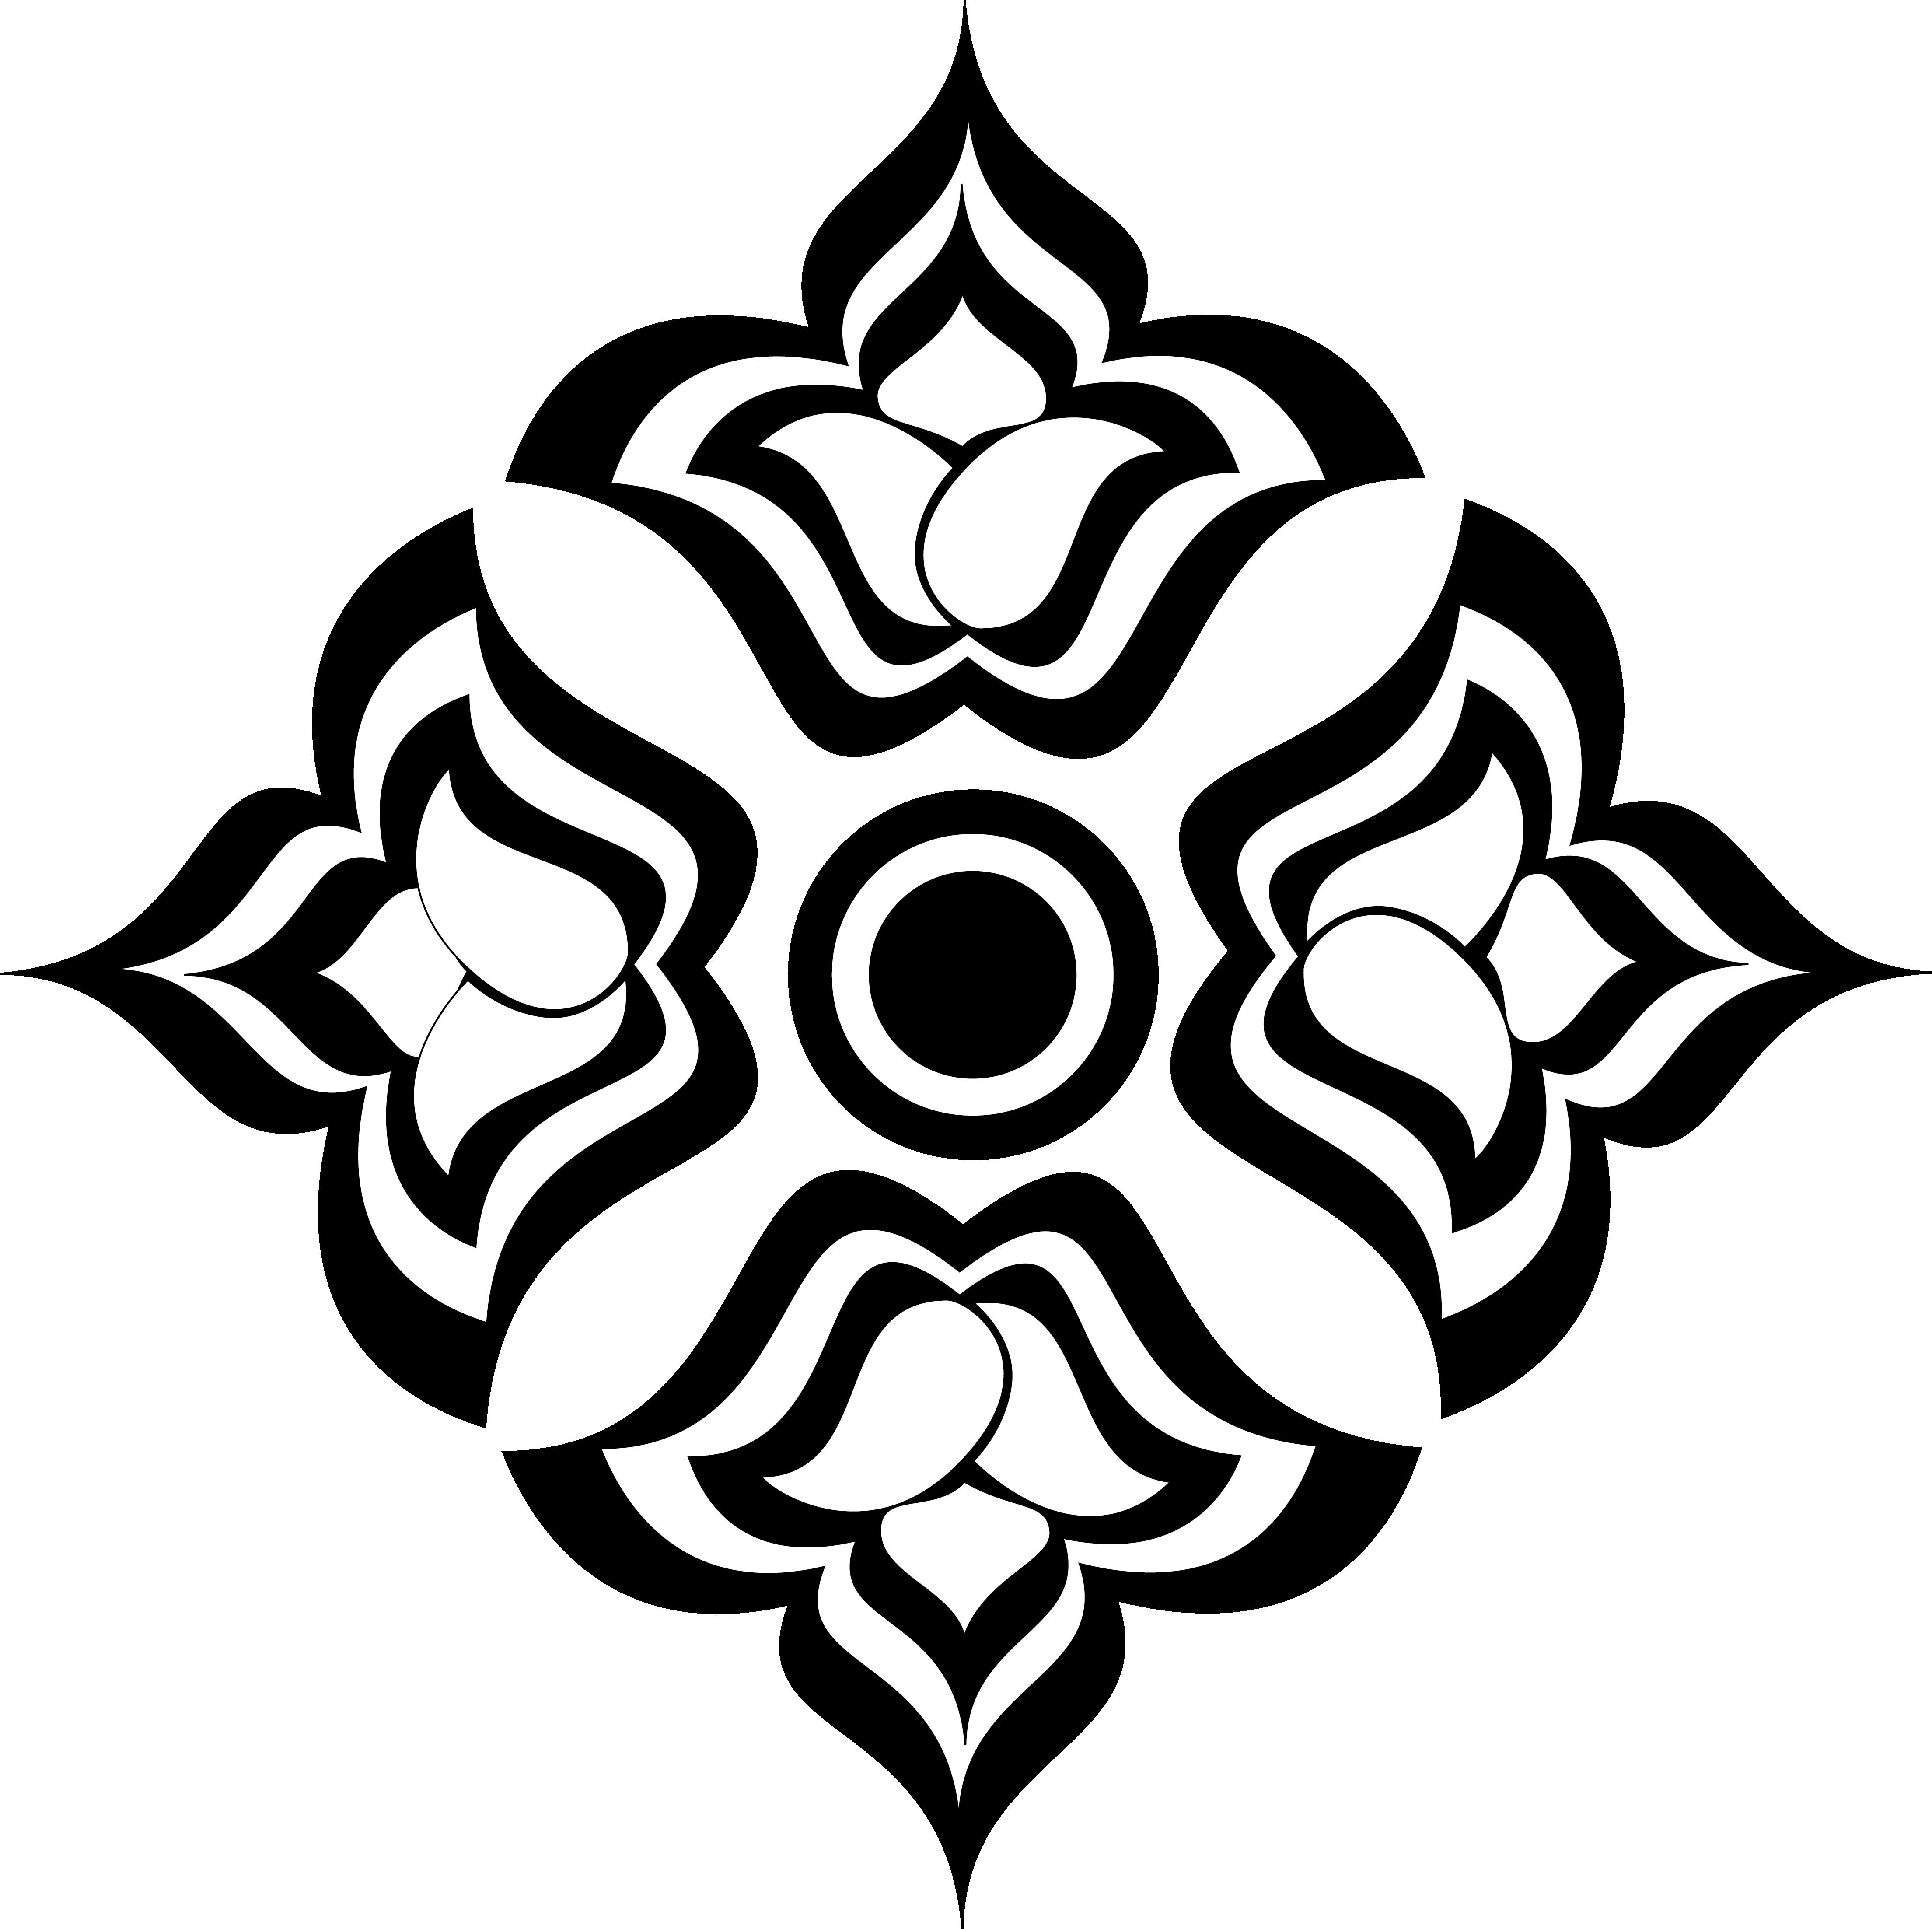 Png Designs Black And White Dragon Silhouette Free Graphic Design Dragon Tattoo Design Simple